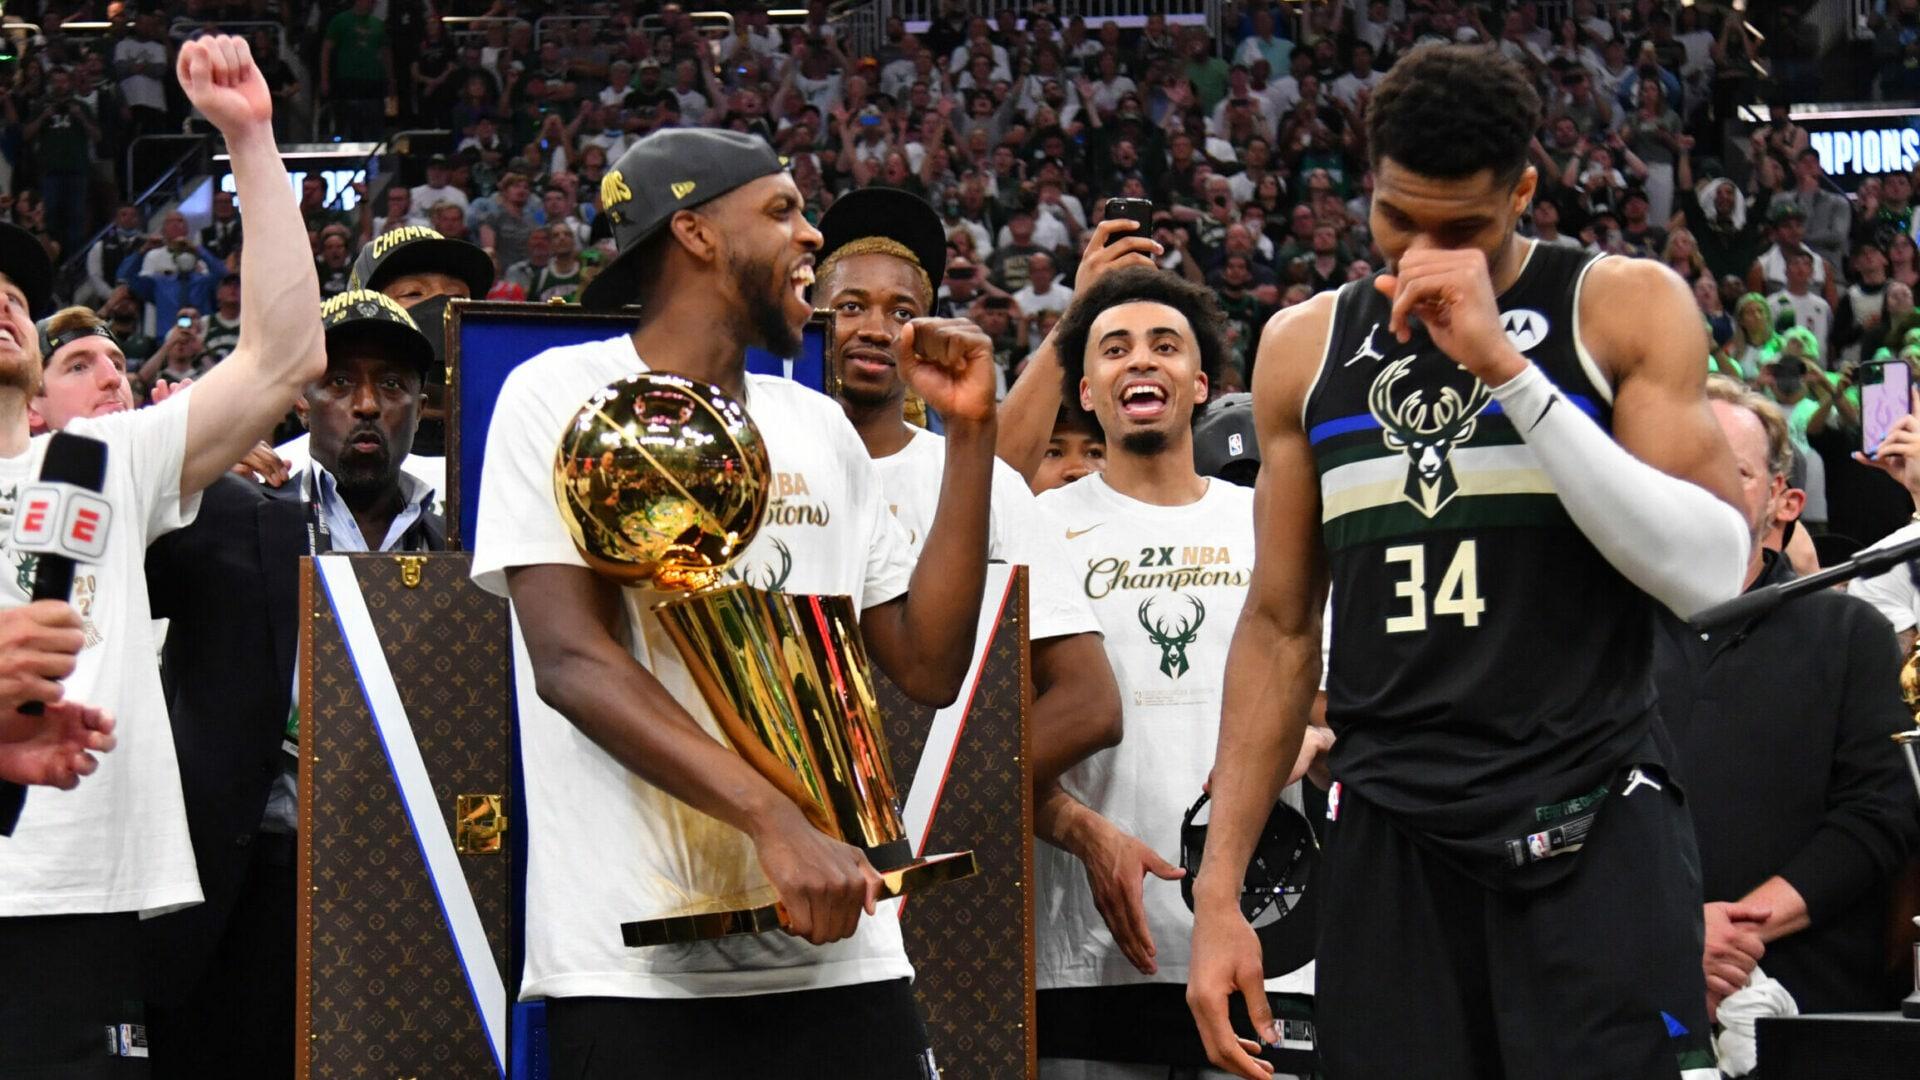 NBA Twitter reacts to Giannis Antetokounmpo, Bucks winning NBA title